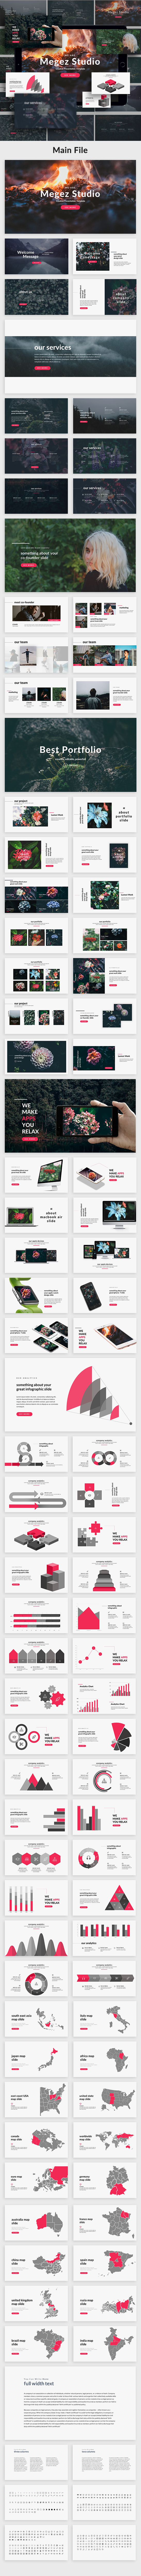 Megez - Creative Powerpoint Template - Creative PowerPoint Templates